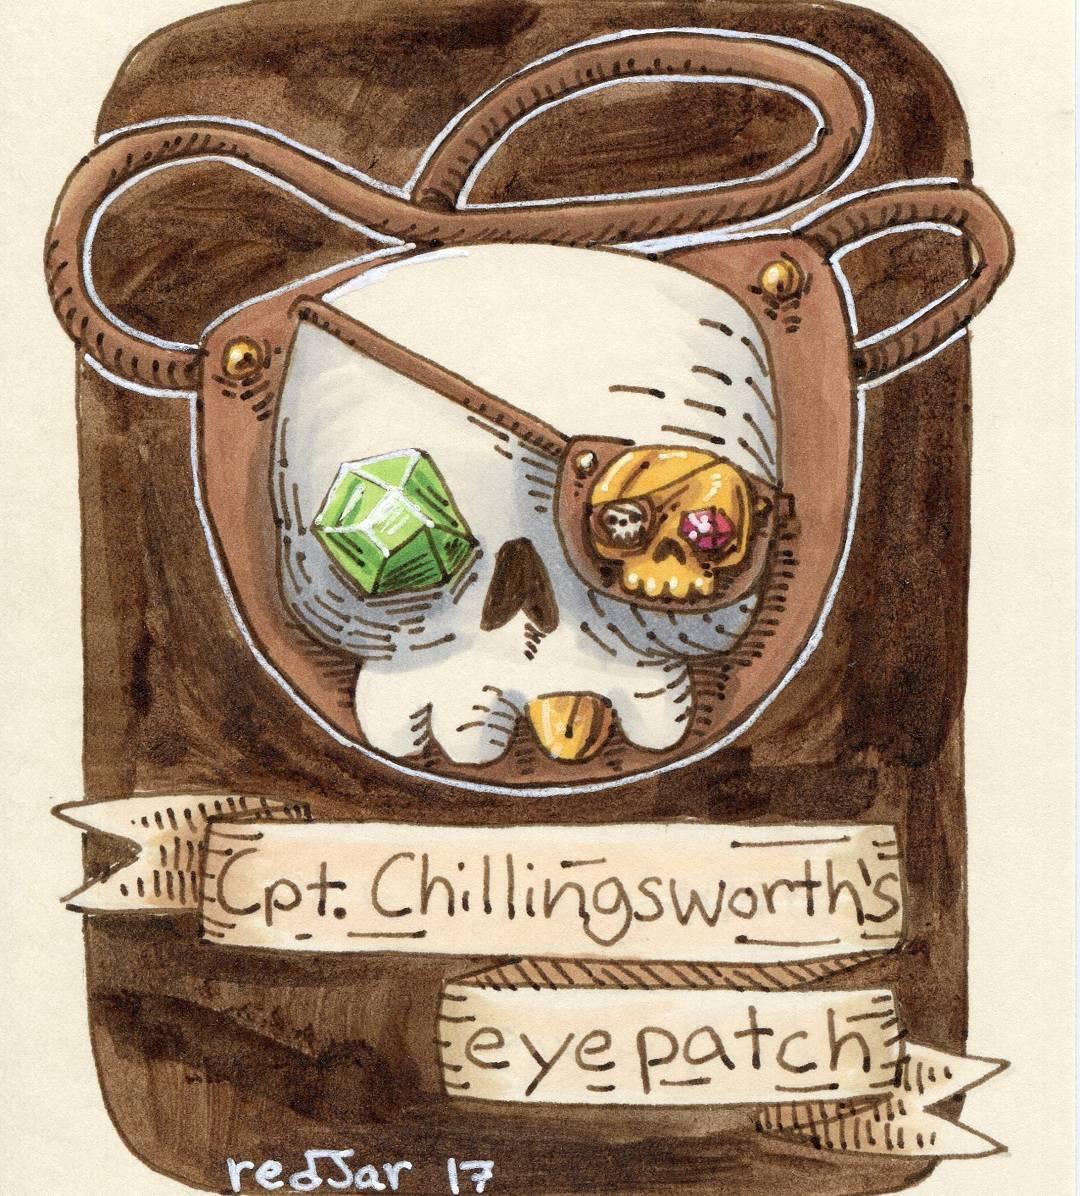 "redjarojam ""Cpt. Chillingsworth's Eyepatch"" - by Jared DeCosta (redjarojam) www.instagram.com/redjarojam (2017-03) © dell'autore tutti i diritti riservati"